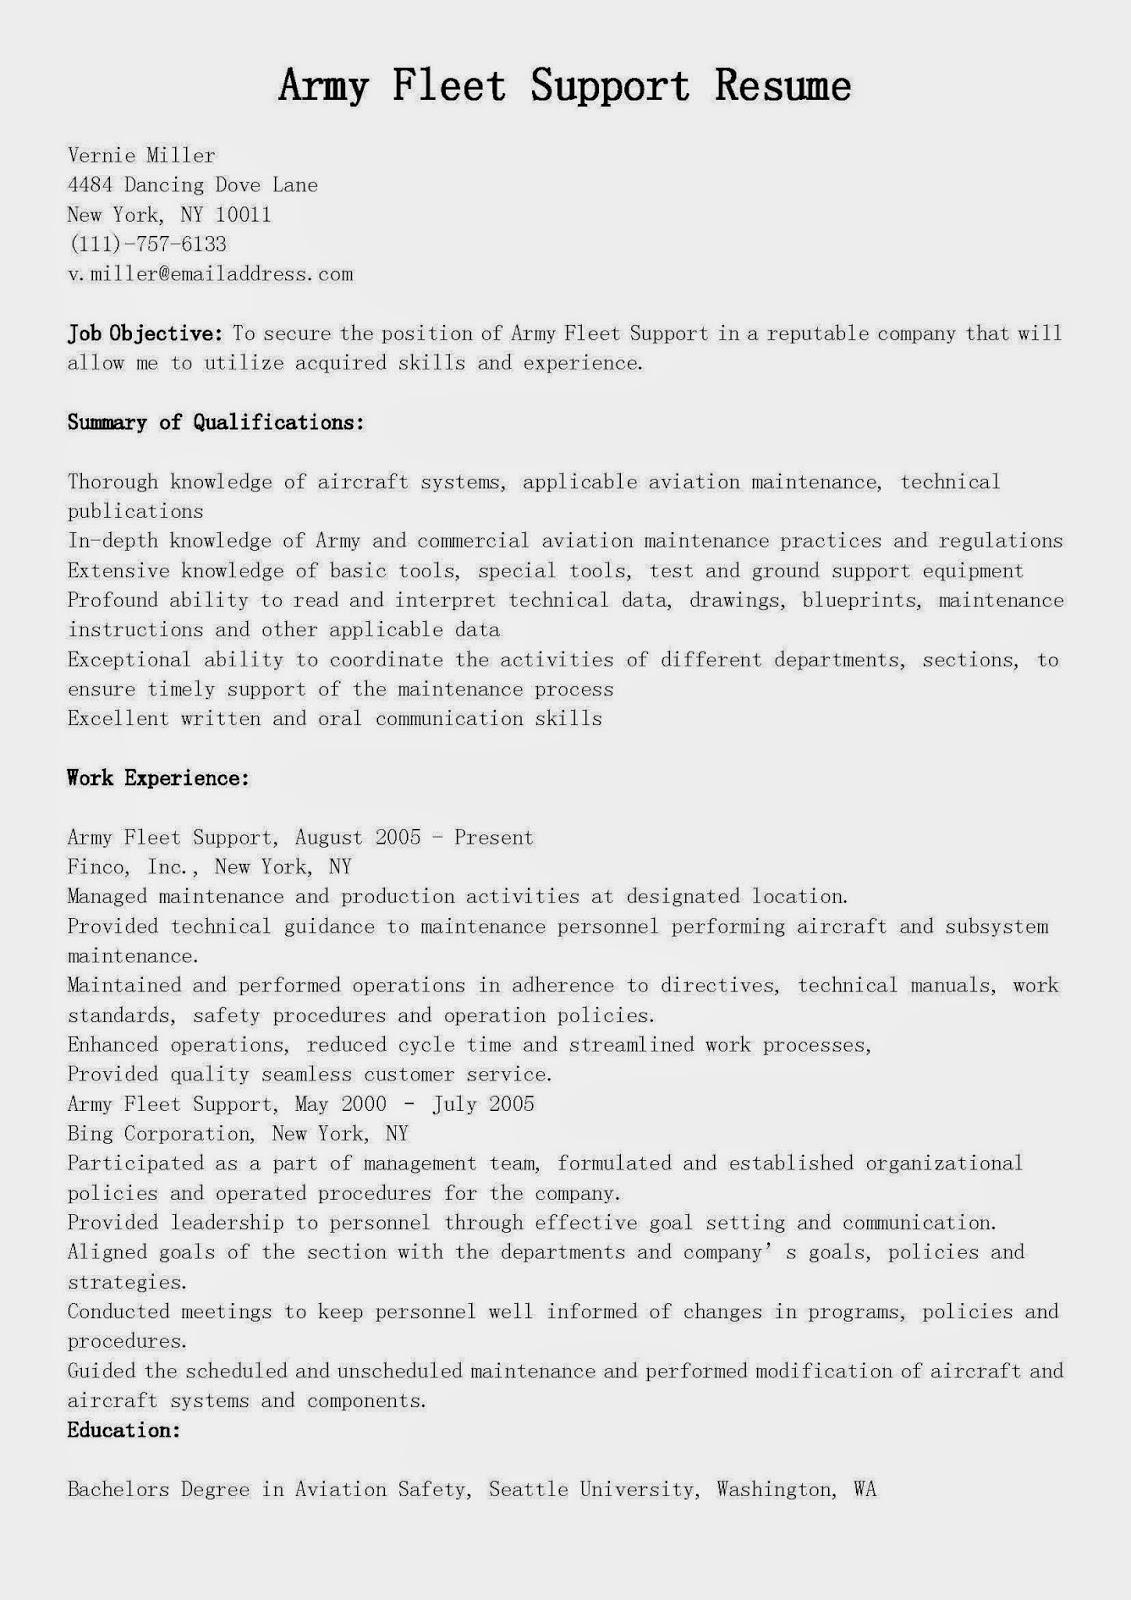 resume samples army fleet support resume sample